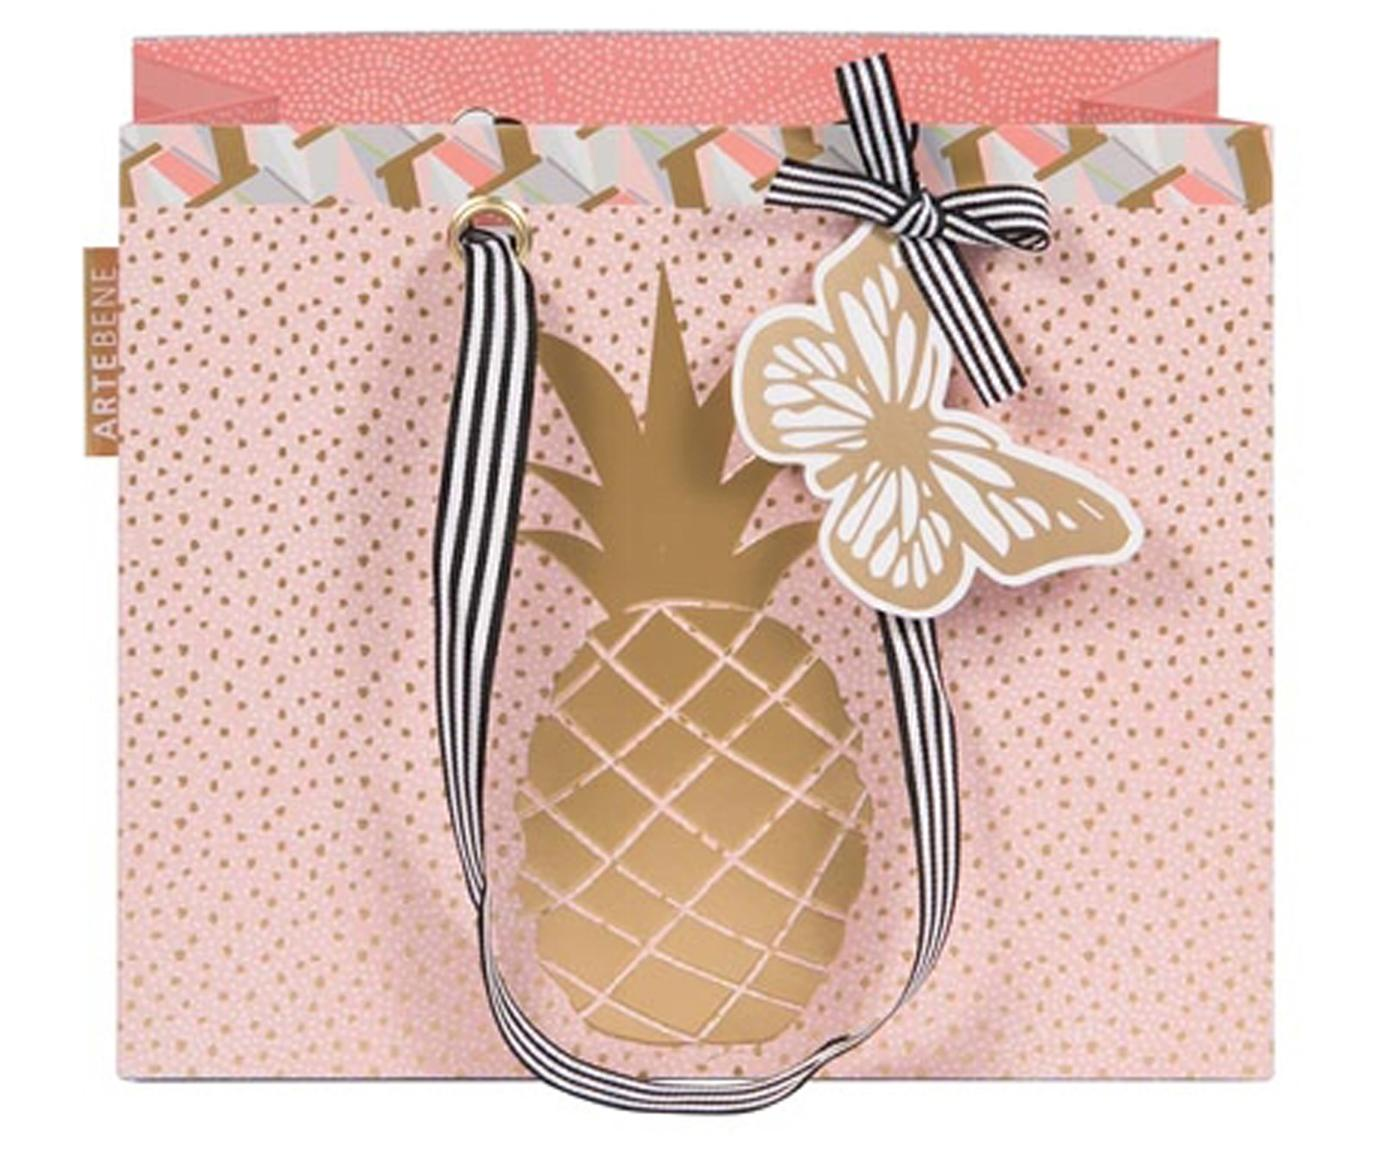 Geschenktasche Pineapple, Tasche: Papier, Griffe: Textil, Rosa, Goldfarben, 22 x 18 cm